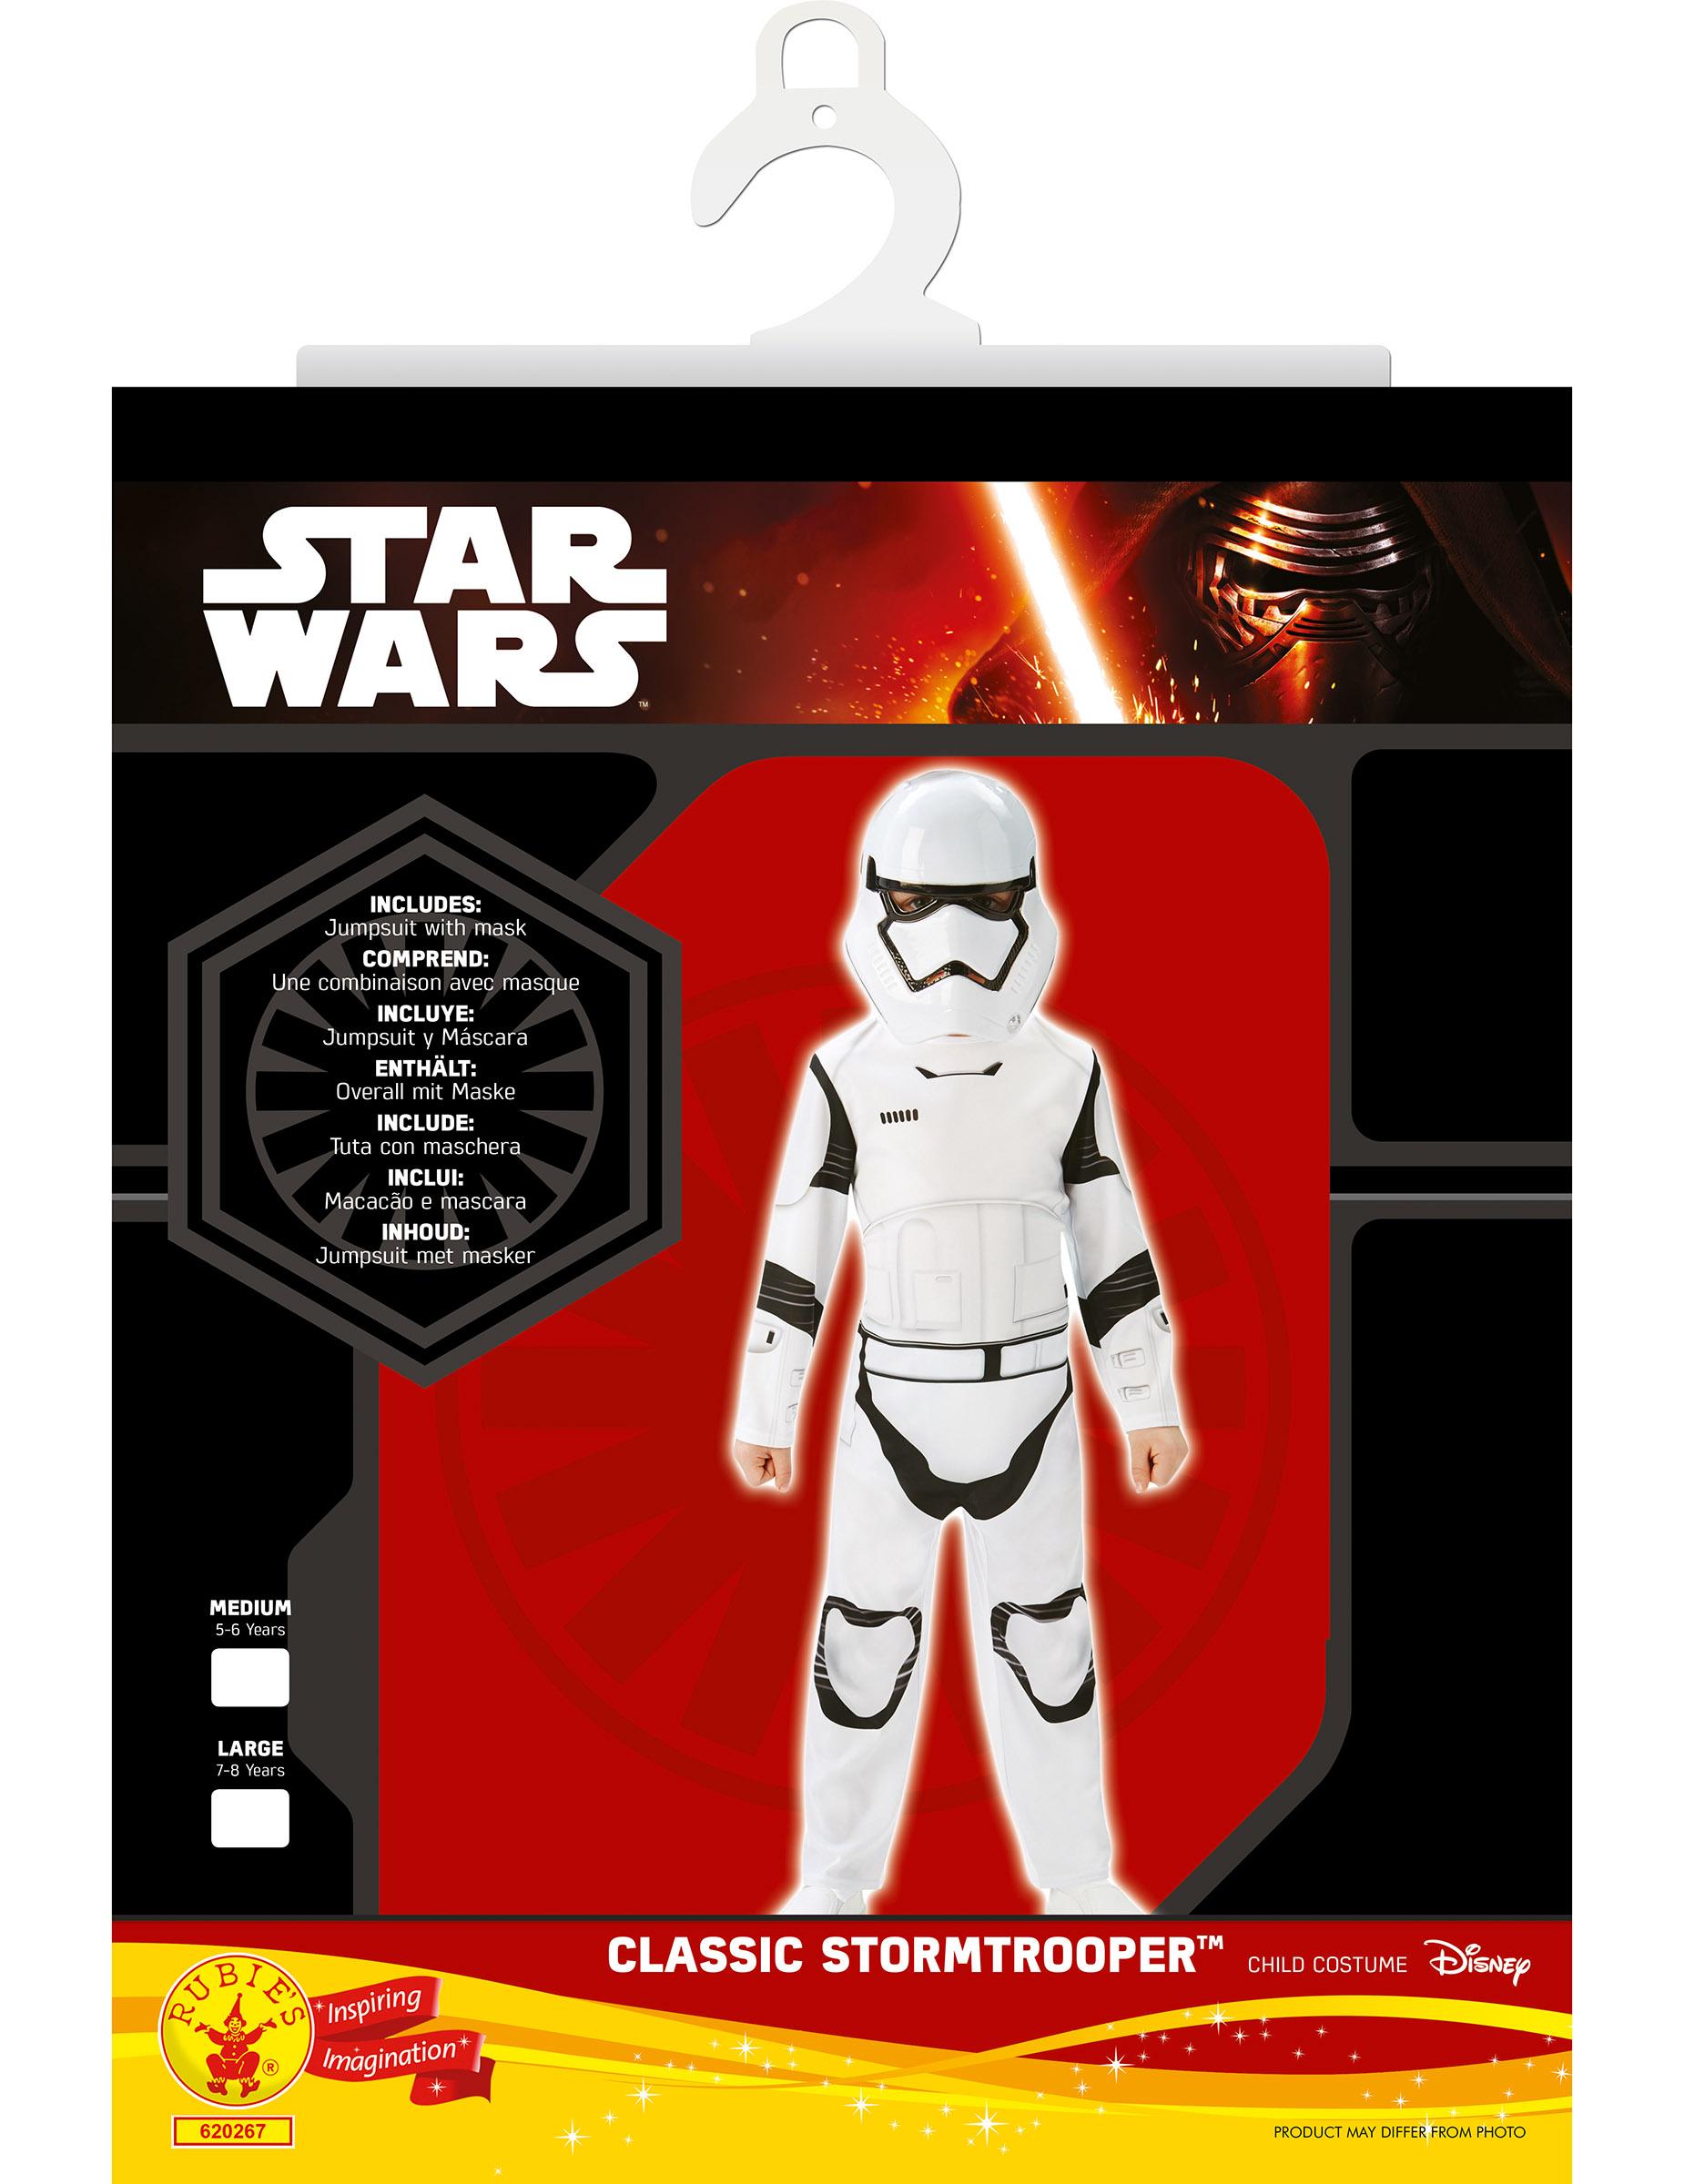 d guisement classique stormtrooper star wars vii. Black Bedroom Furniture Sets. Home Design Ideas